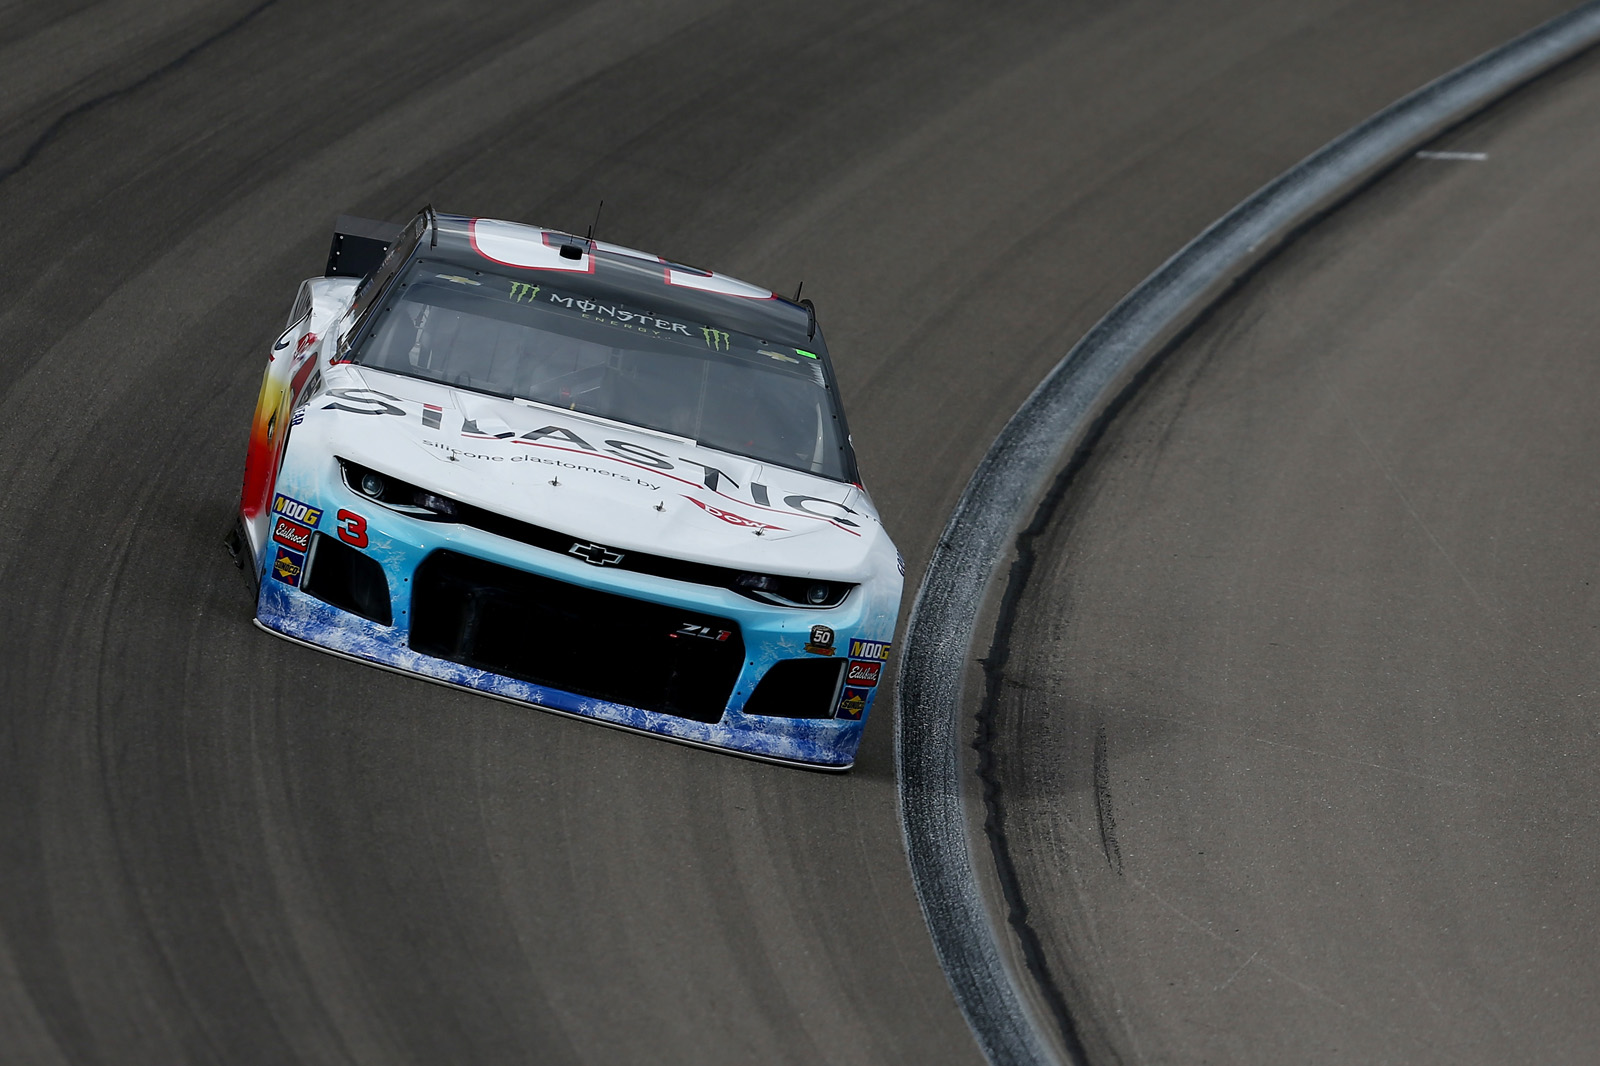 Las Vegas Motor Speedway – Day 3 – Pennzoil 400 Practice